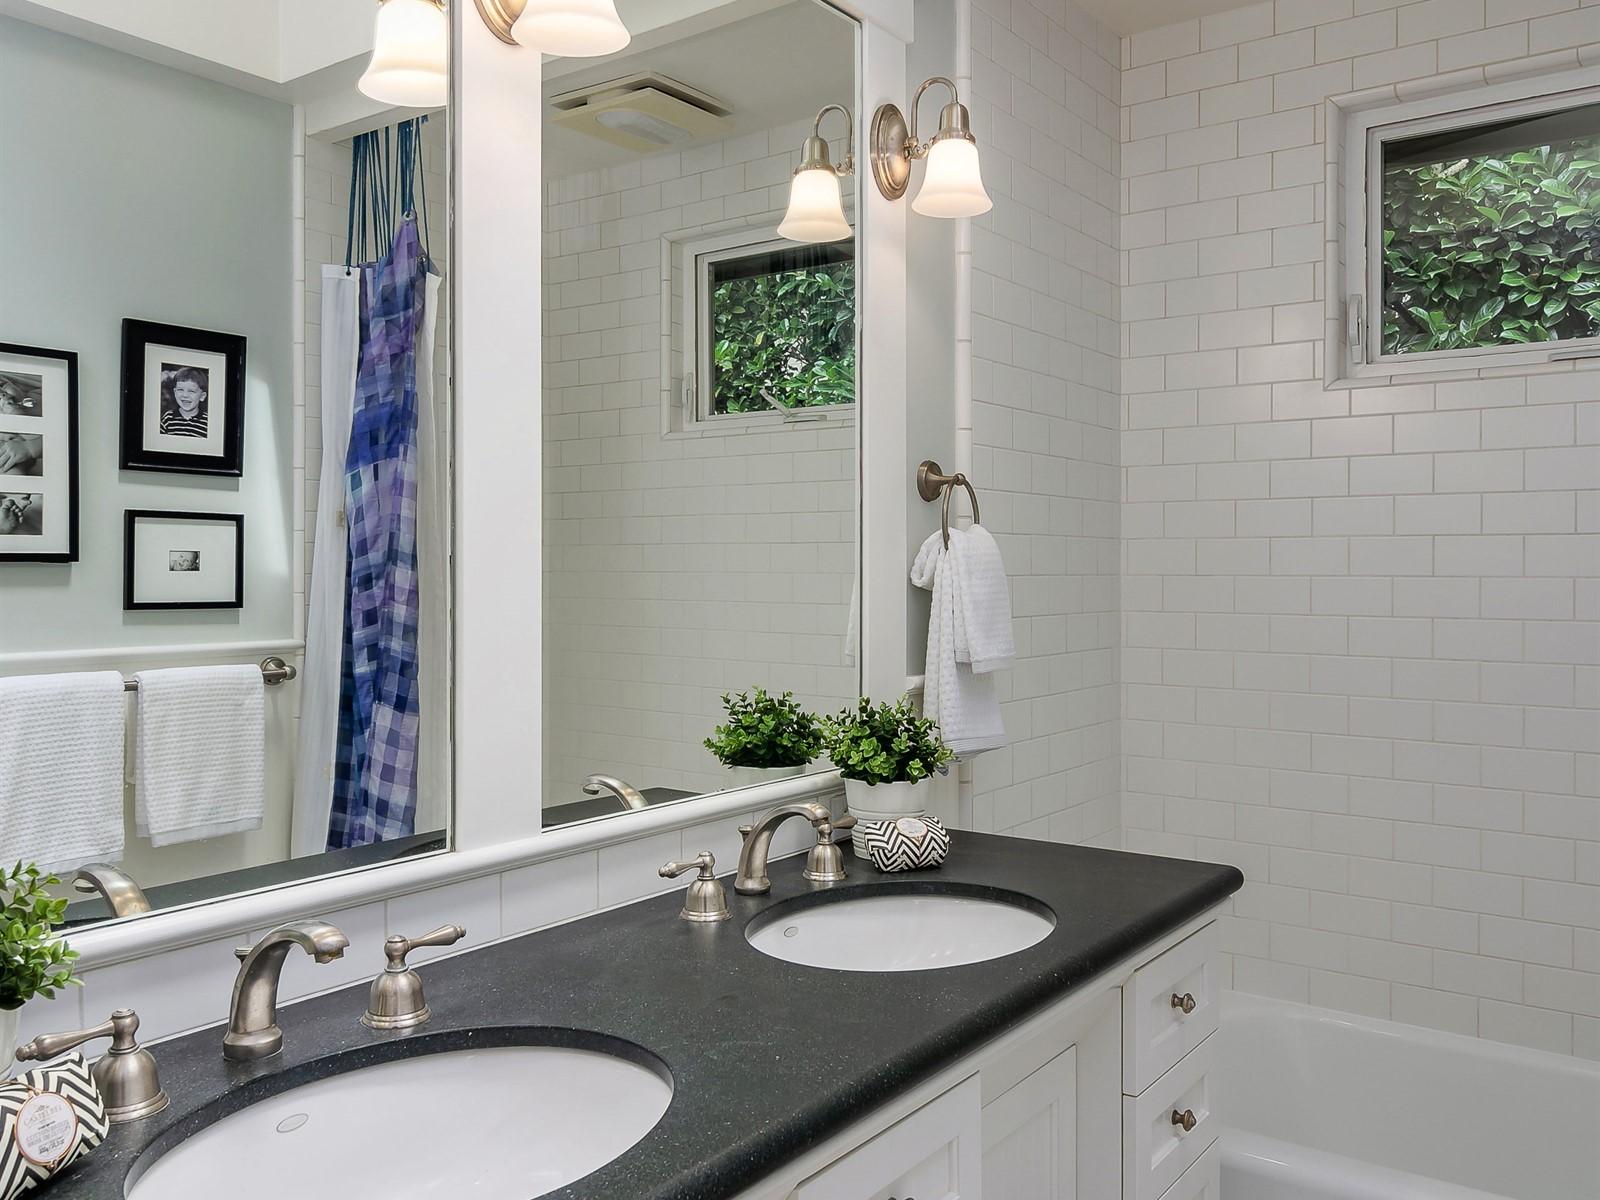 031_Bathroom.jpg